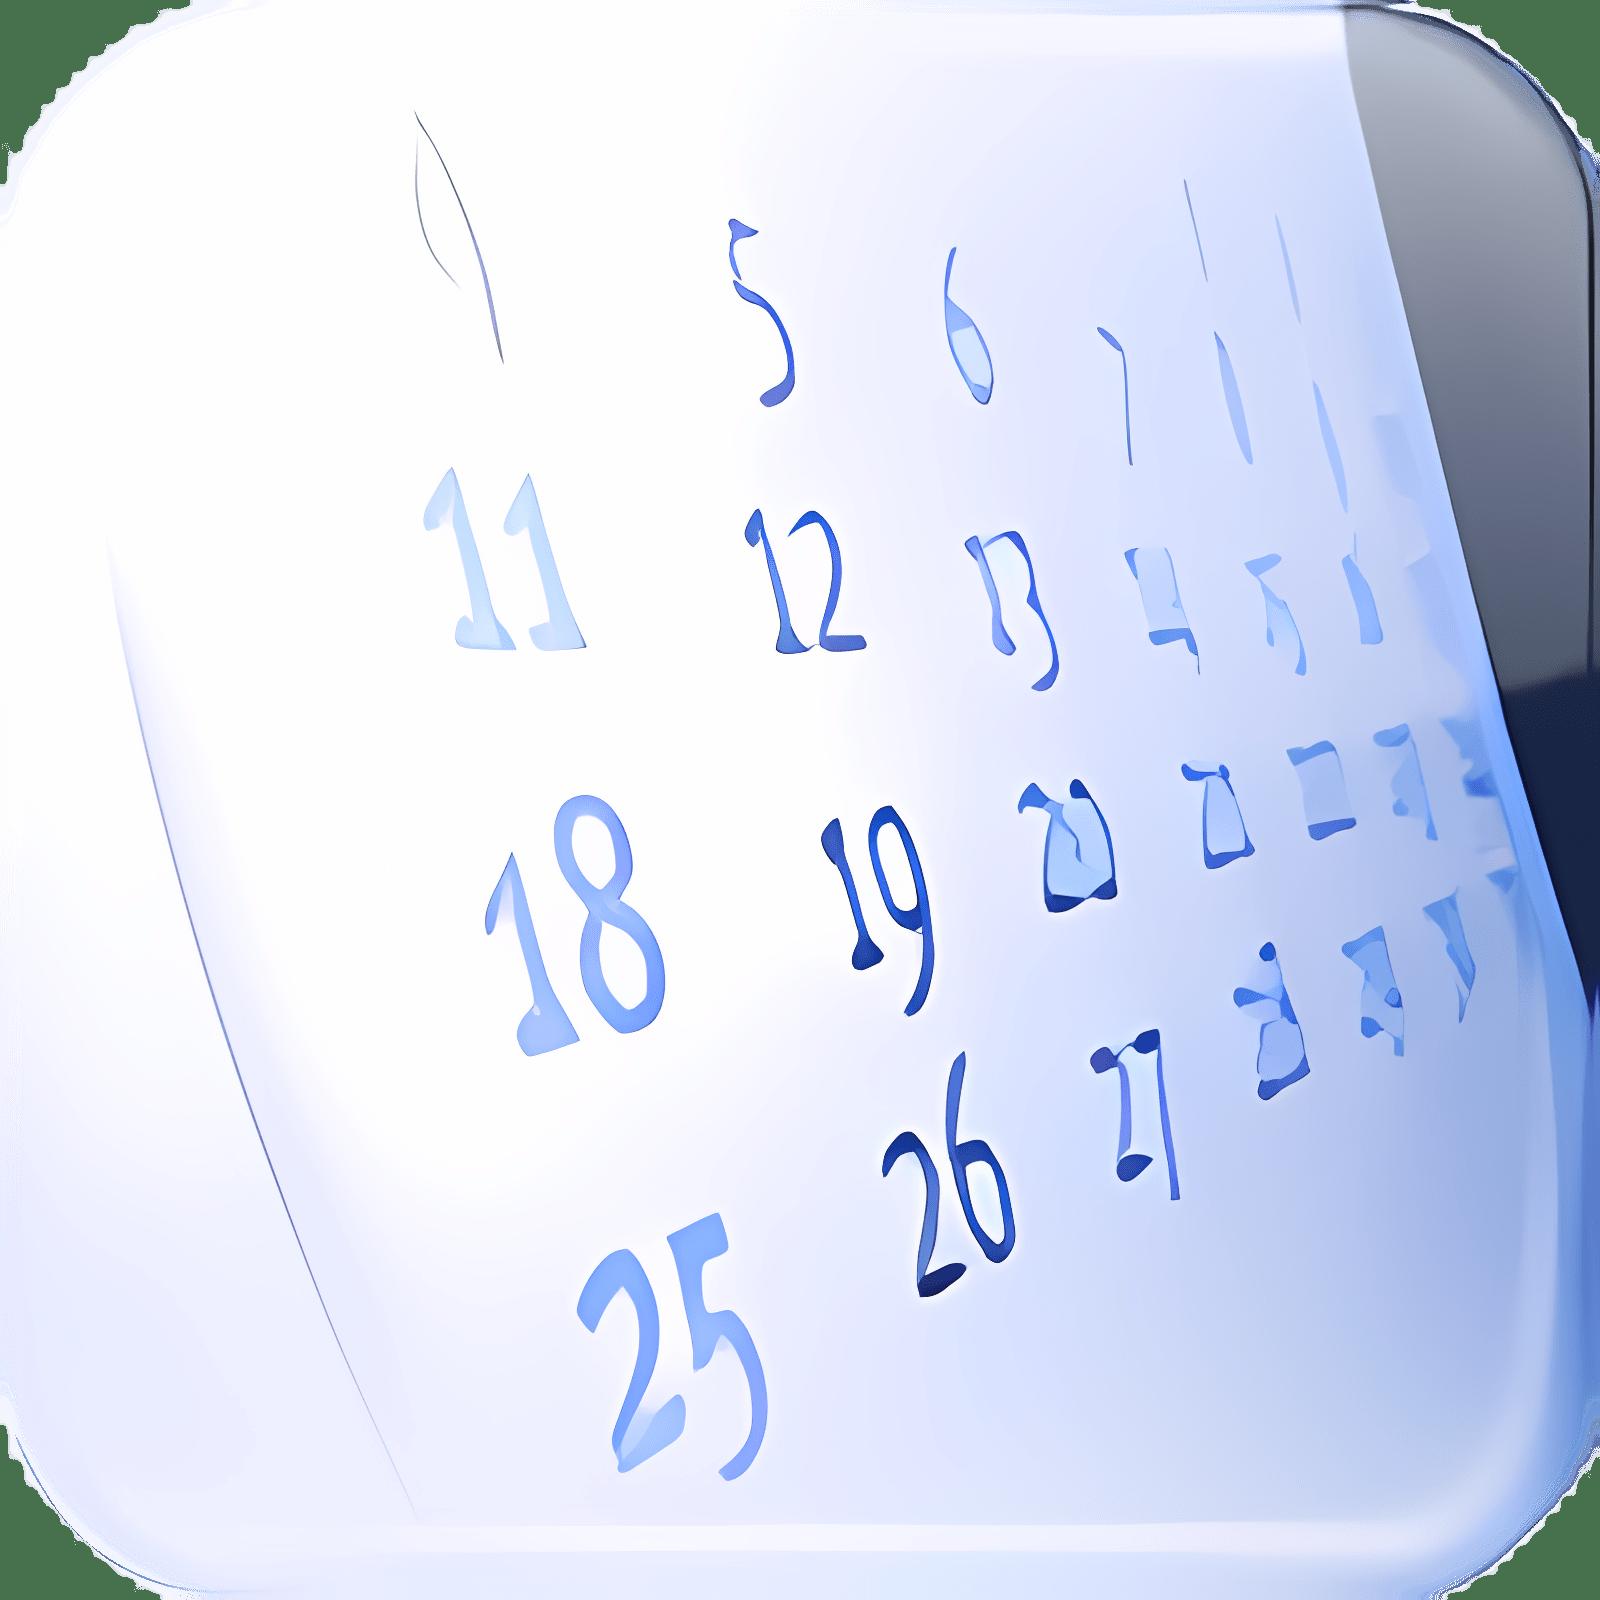 CalendarPainter